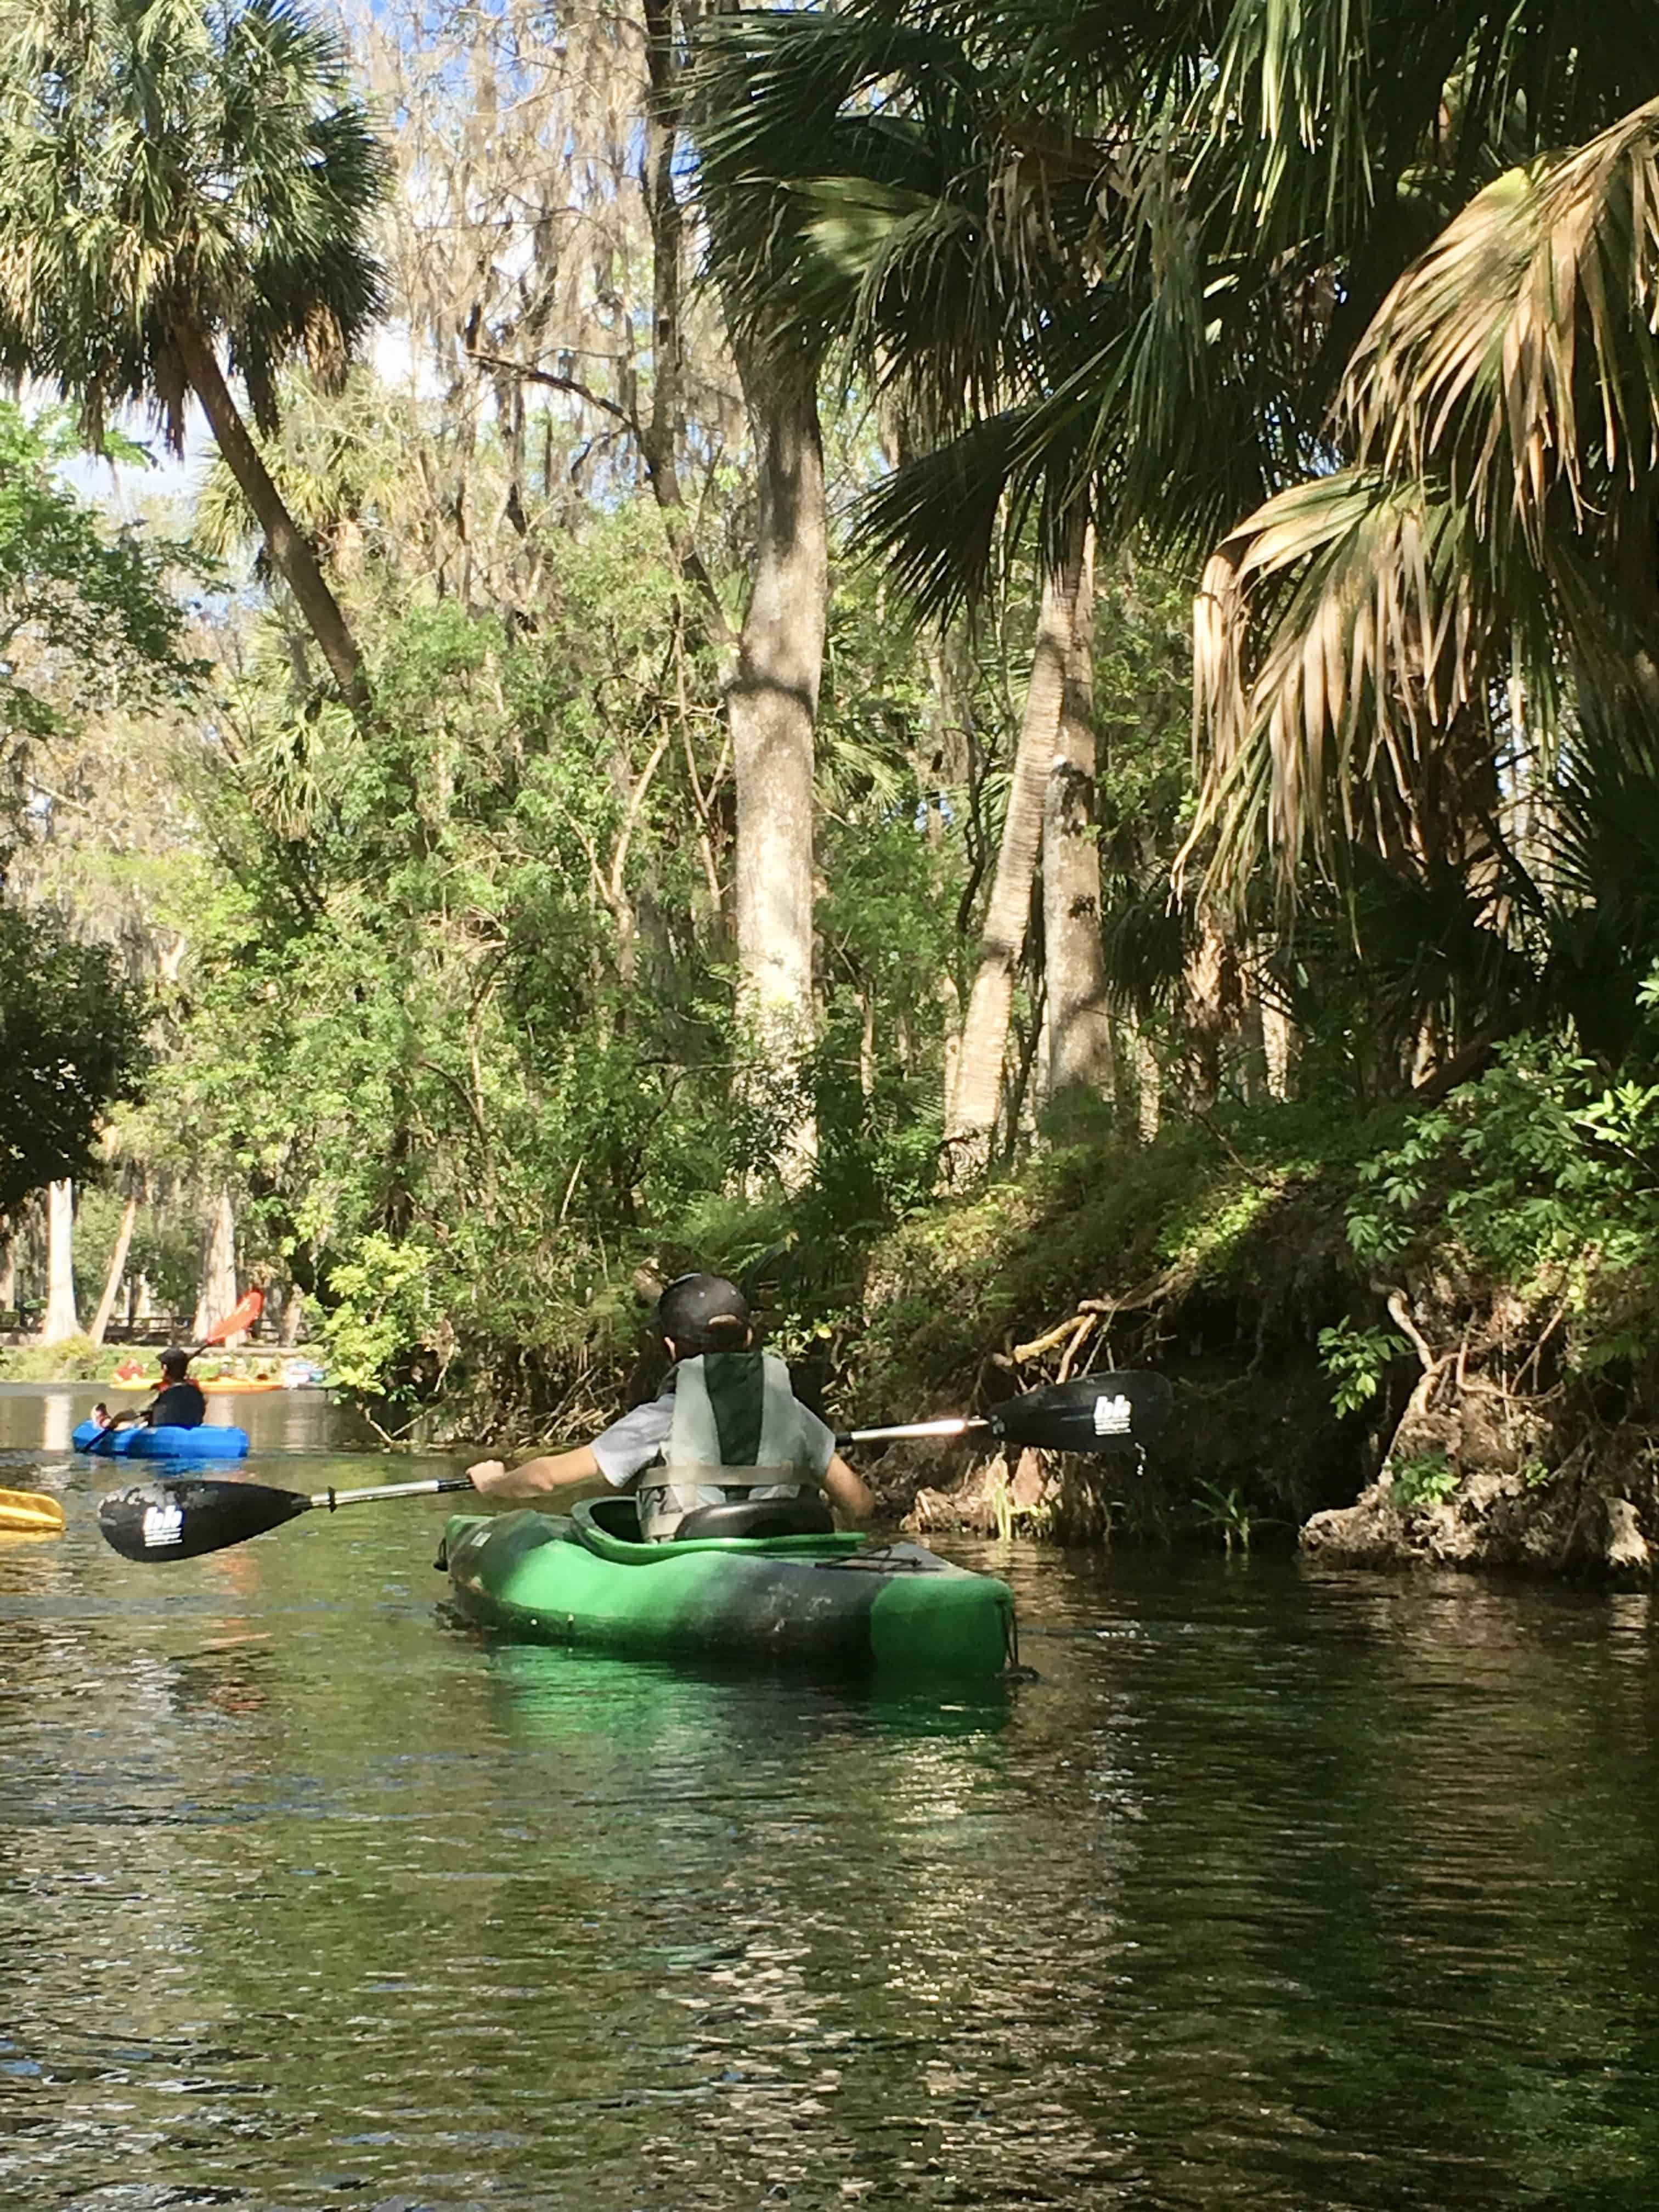 Kayaking Adventures In Silver Springs, Florida.